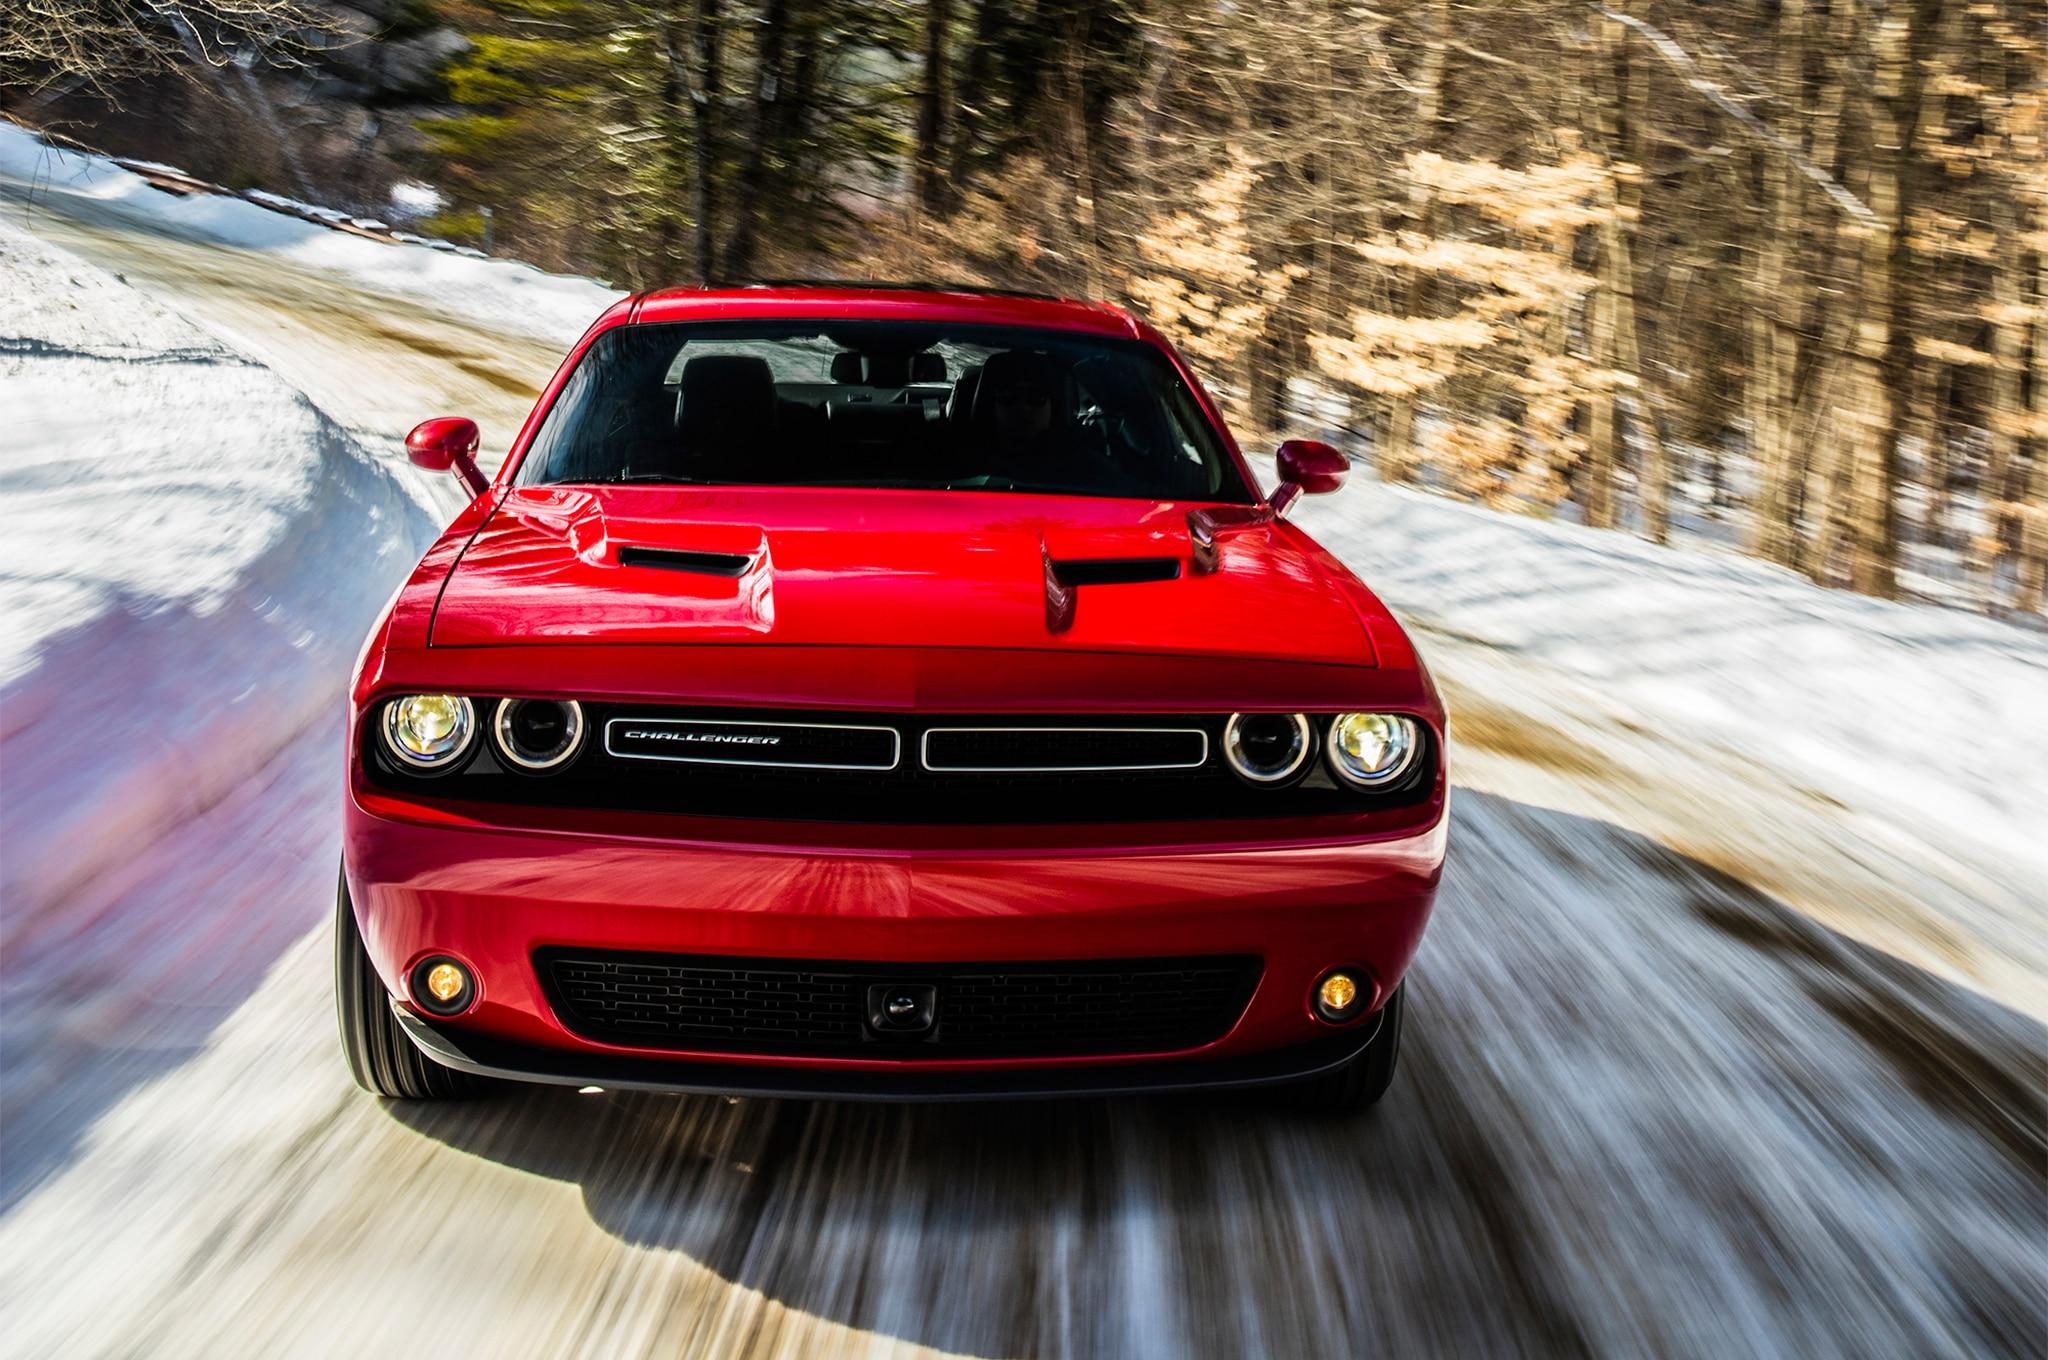 Used Dodge Challenger Cars Find Dodge Challenger Cars For